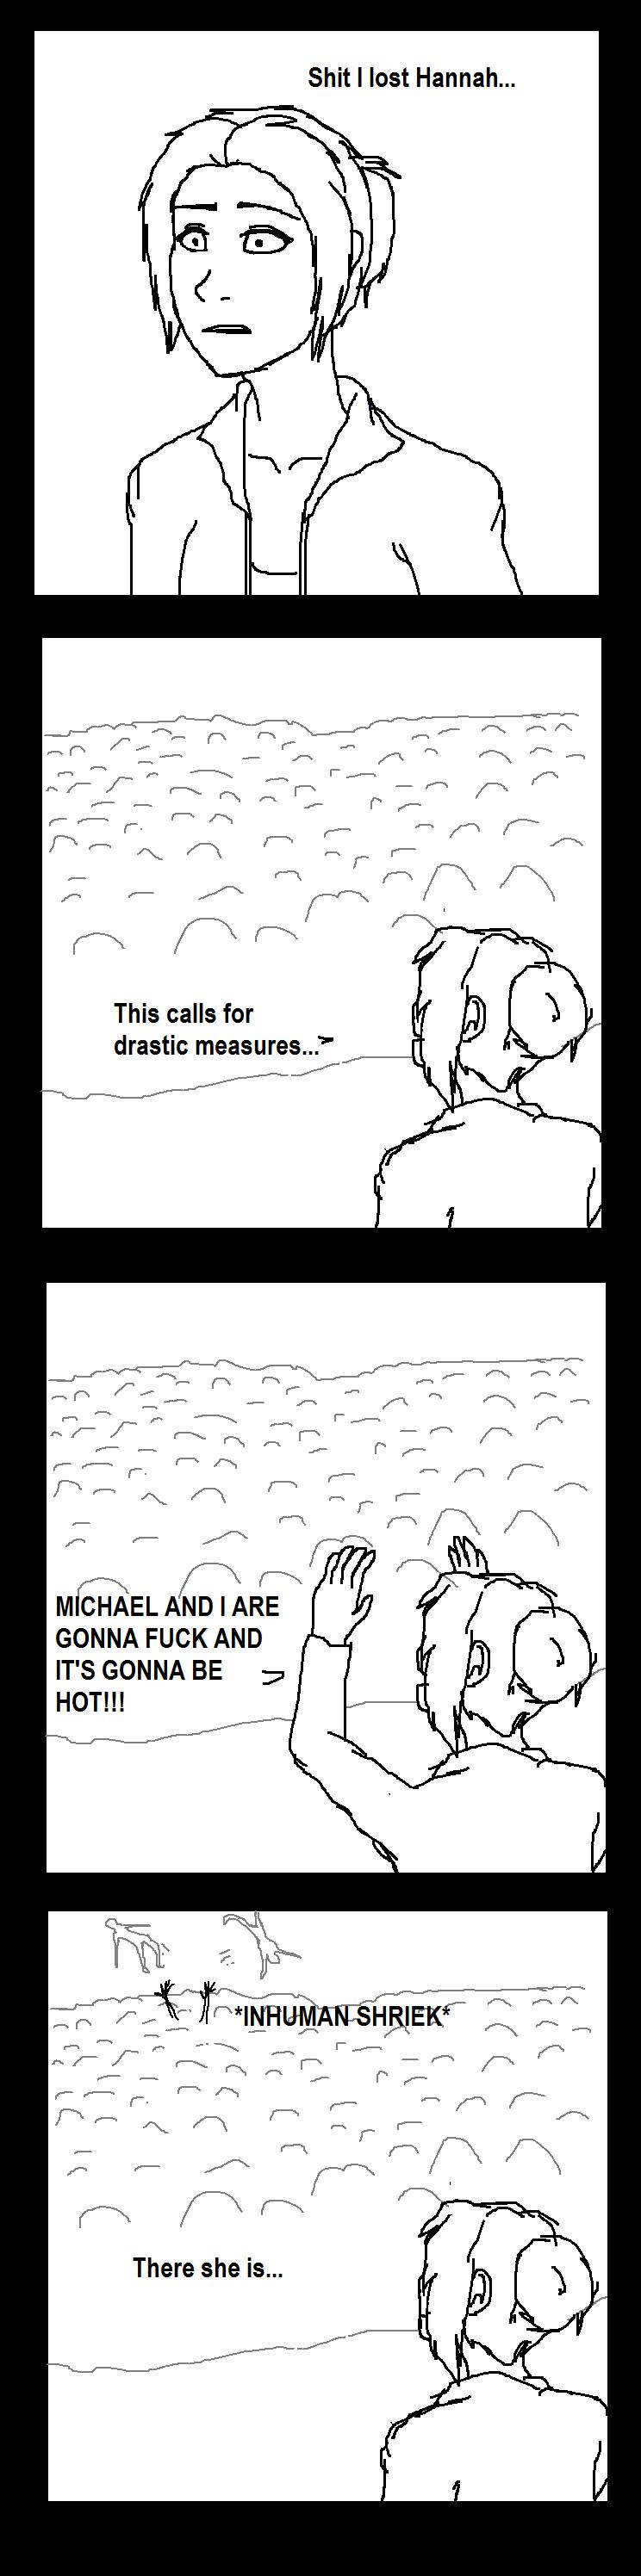 Lost In A Crowd Meme... by Redspets